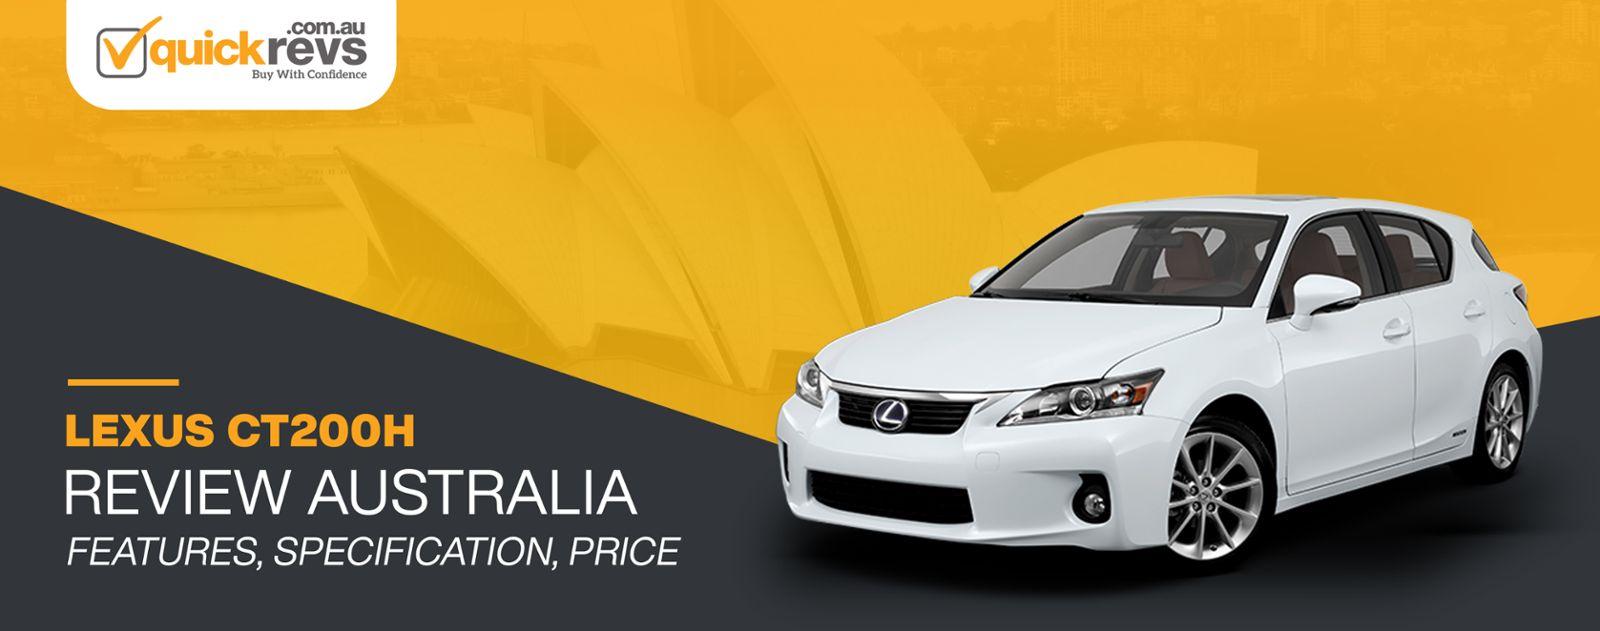 Lexus ct200h Review Australia